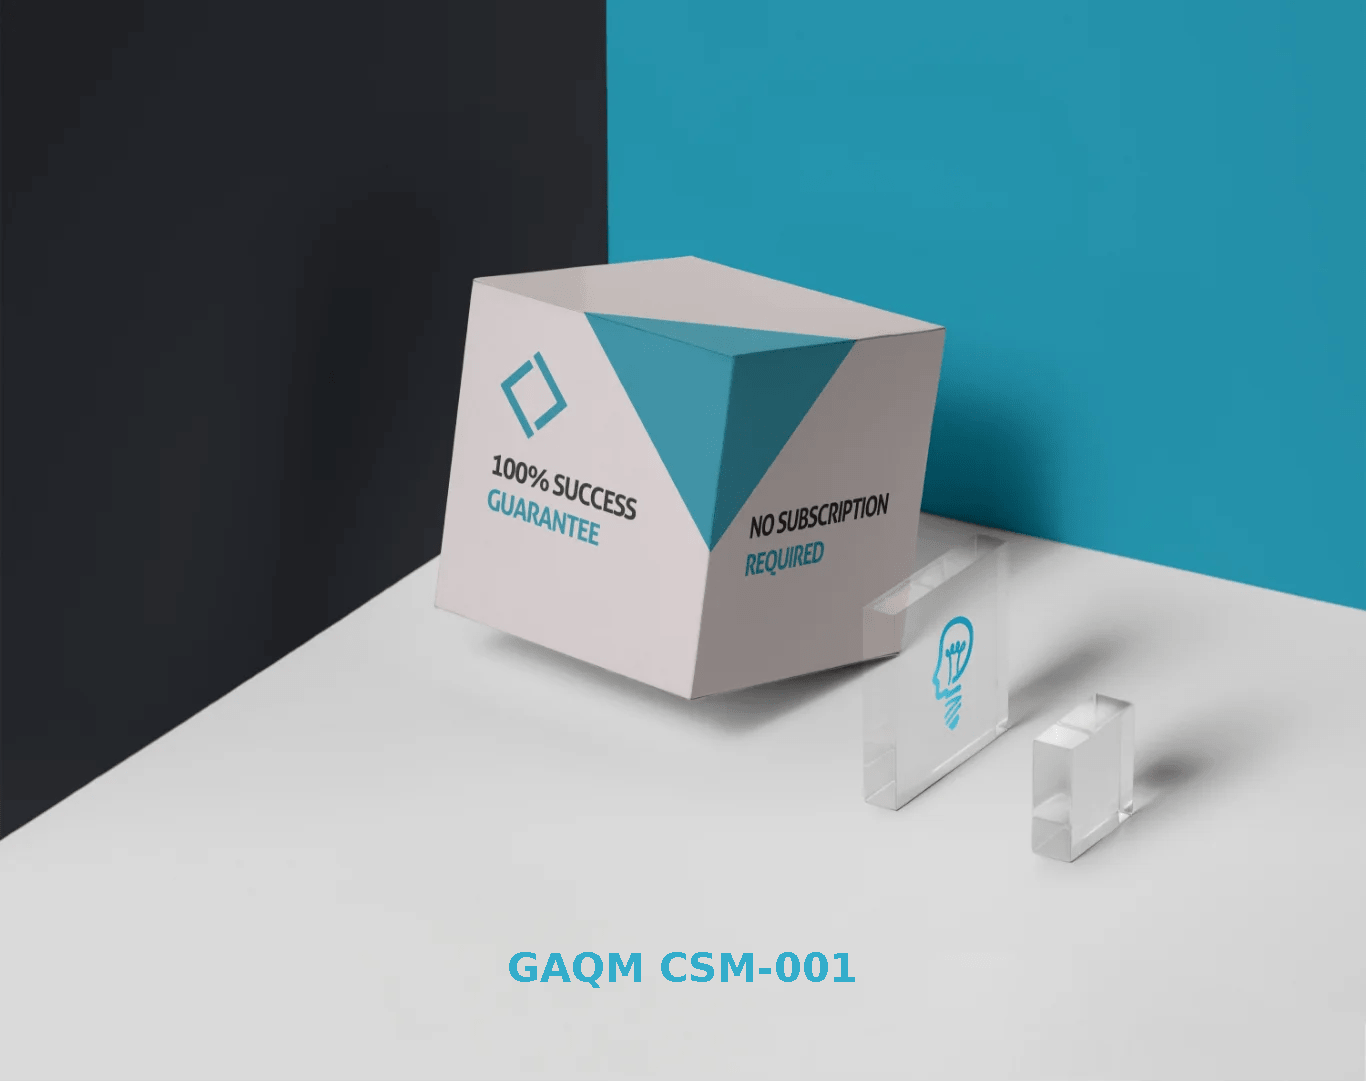 GAQM CSM-001 Exams